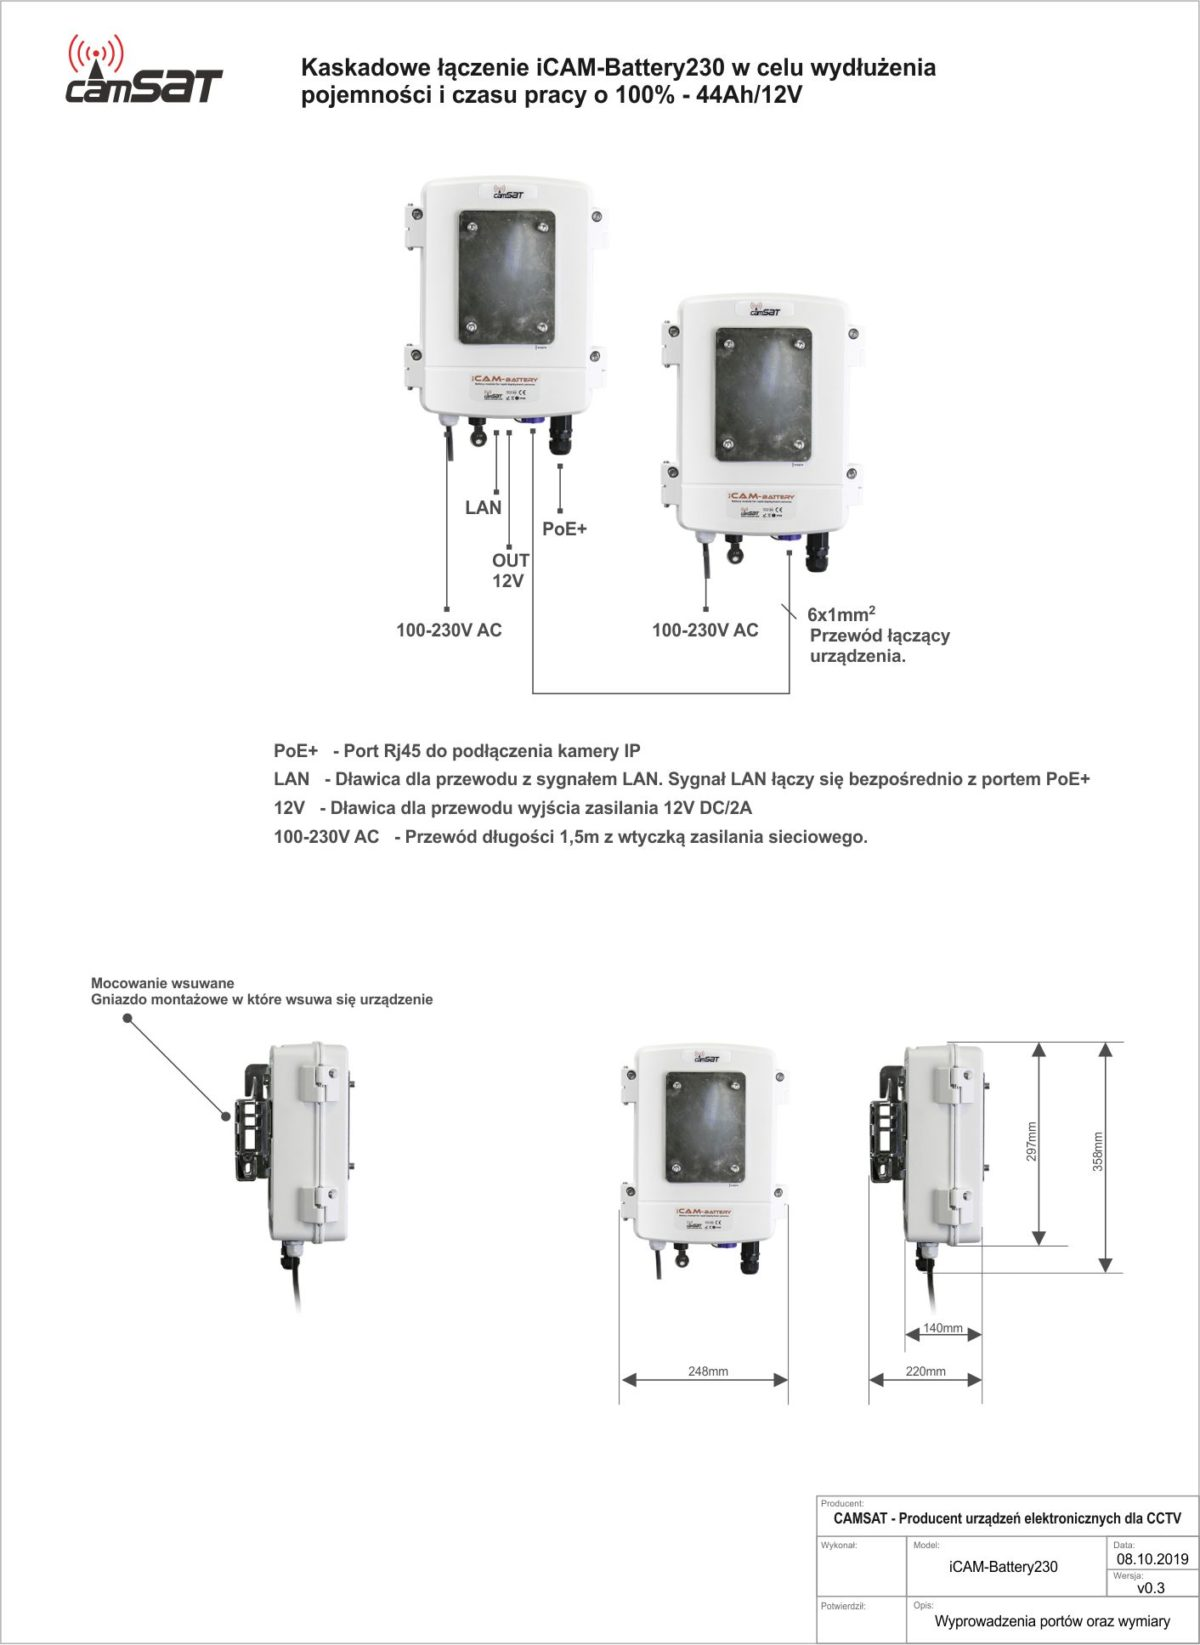 Karta katalogowa i wymiary iCAM-Battery230